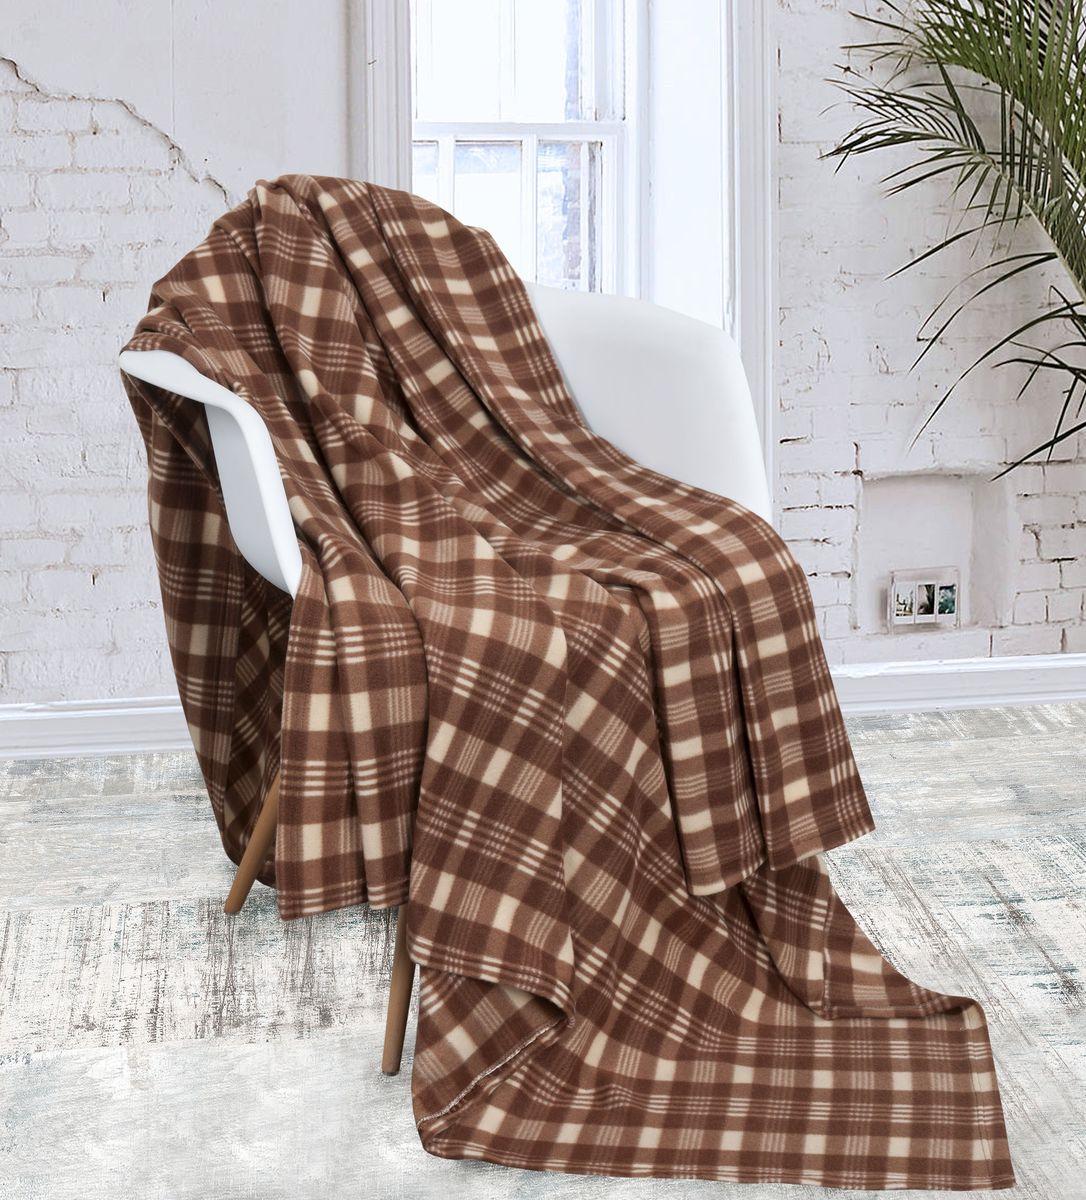 Плед-покрывало Guten Morgen Арахис, ПФарх-180-200, коричневый, 180 х 200 см